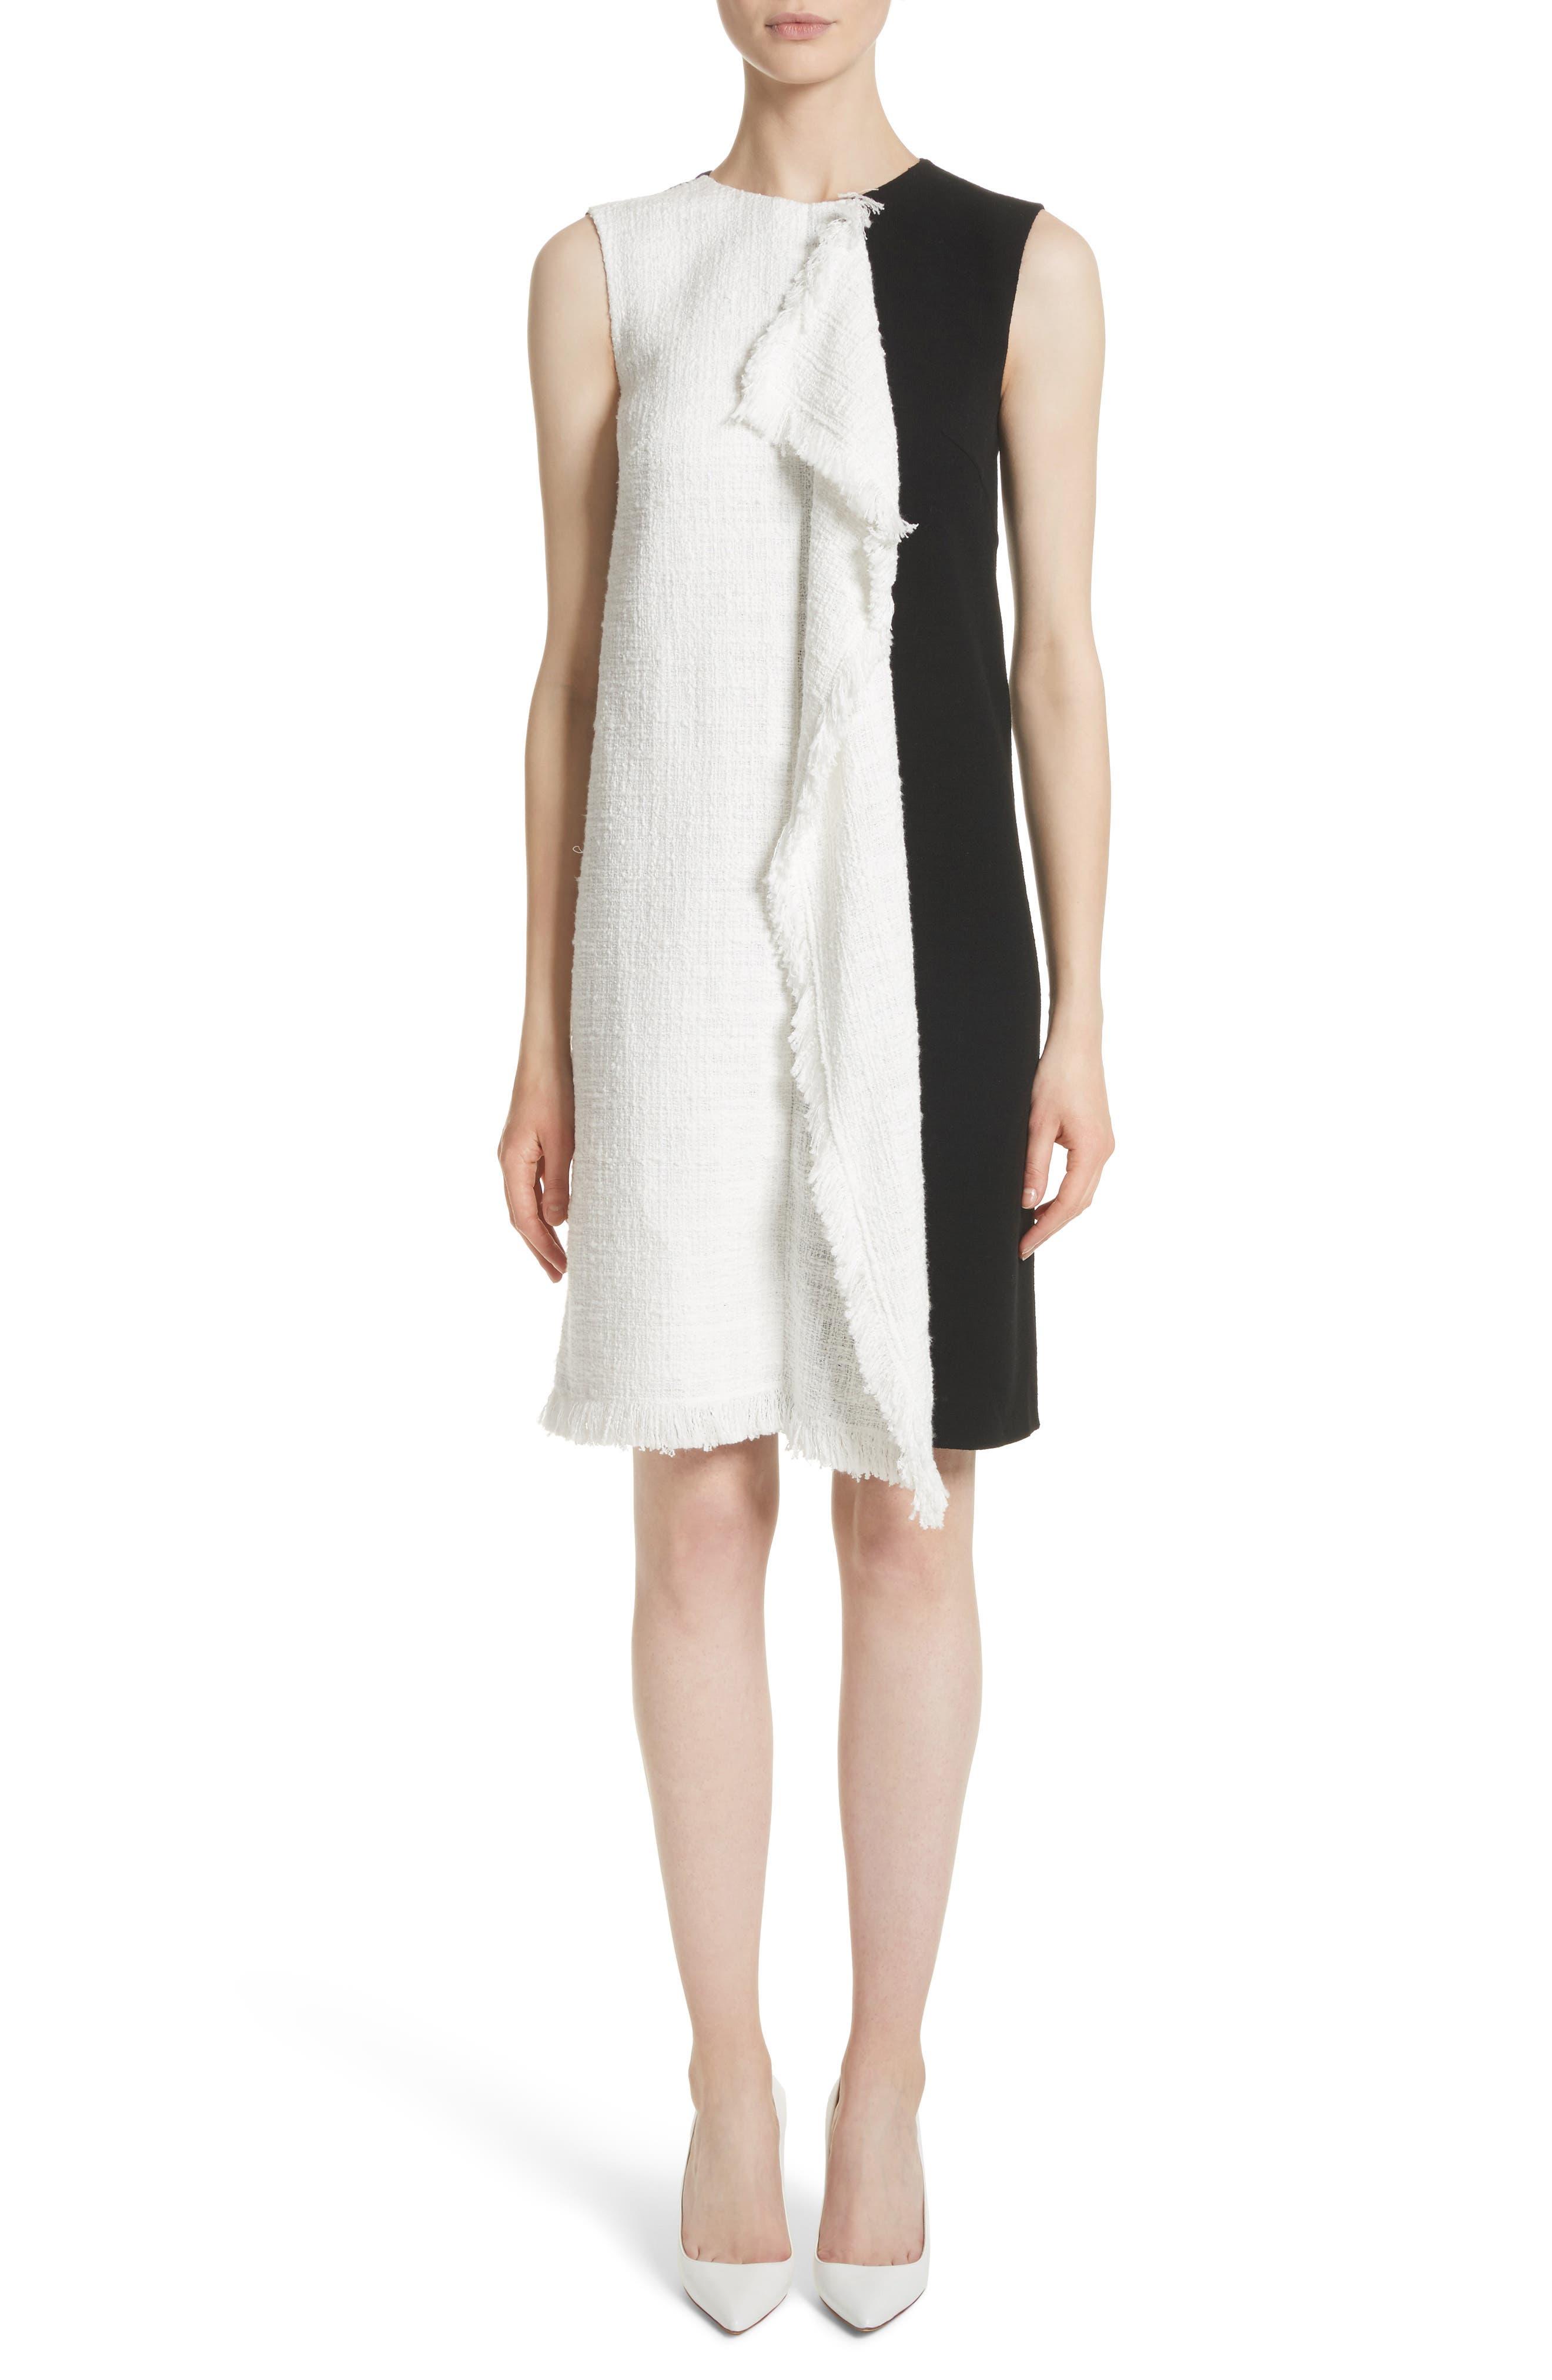 Alternate Image 1 Selected - Oscar de la Renta Cascade Tweed Shift Dress